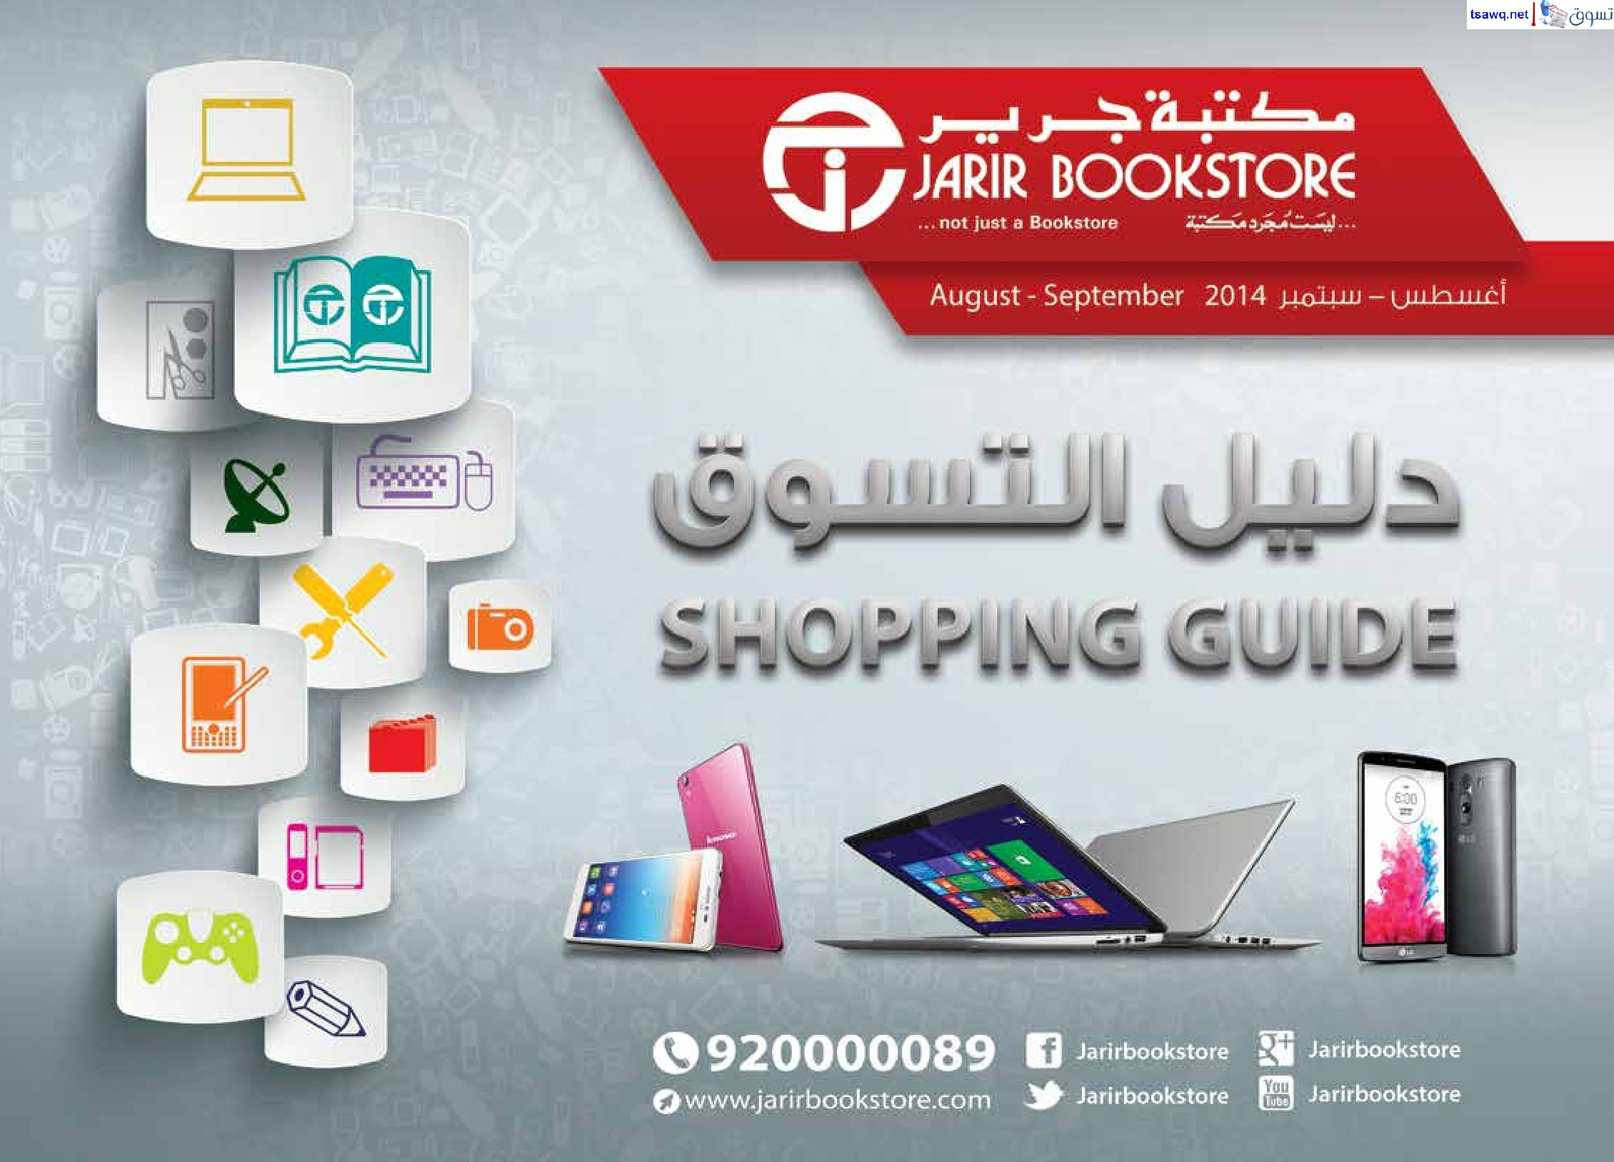 01538dd6d Calaméo - دليل التسوق من جرير السعودية أغسطس - سبتمبر 2014 عدد 188 صفحة